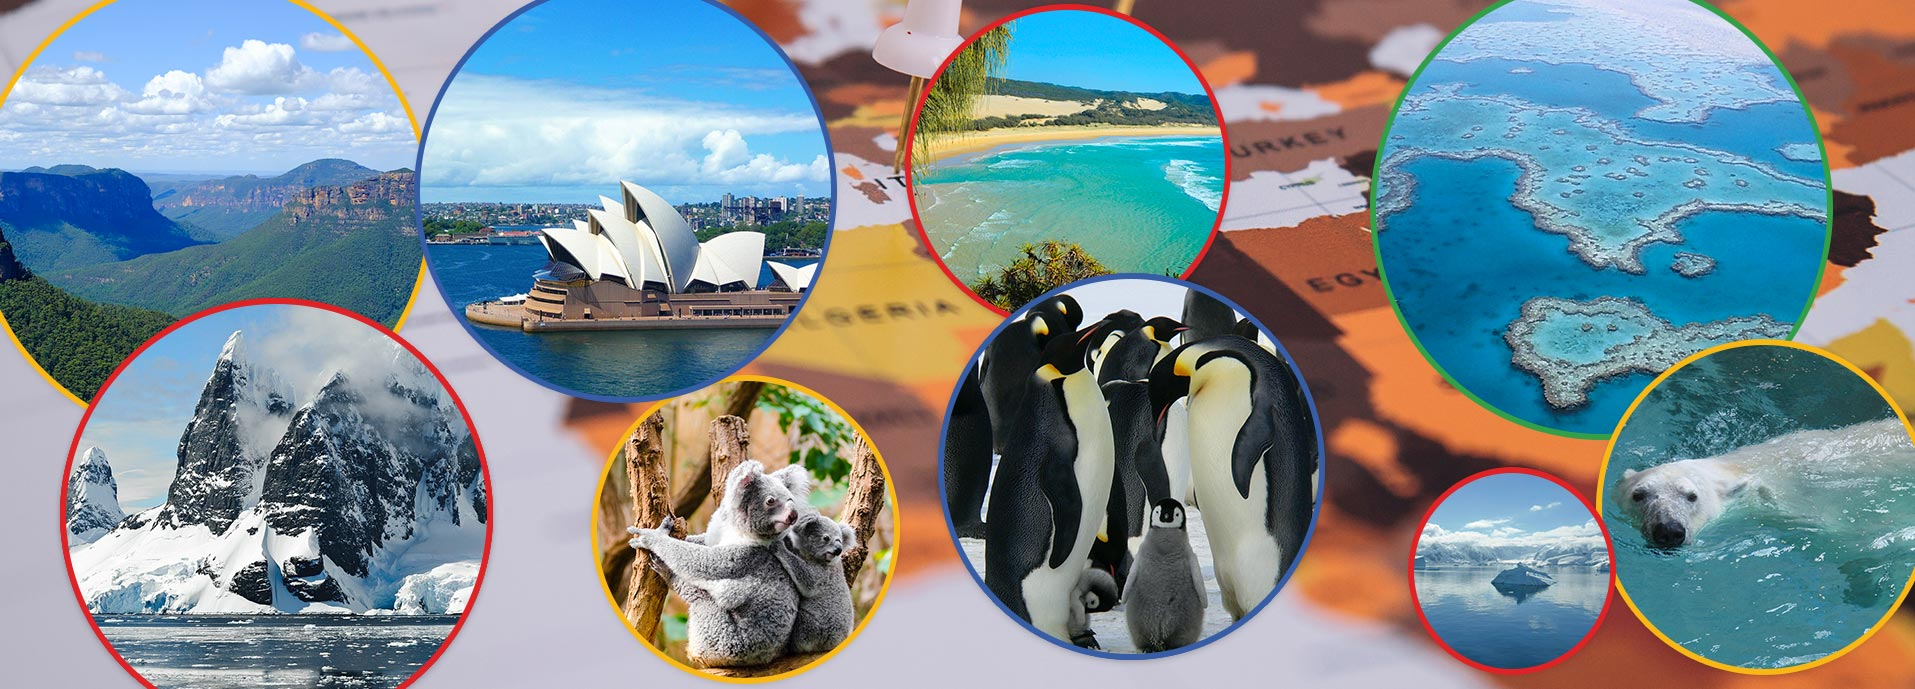 Australija i Antarktik